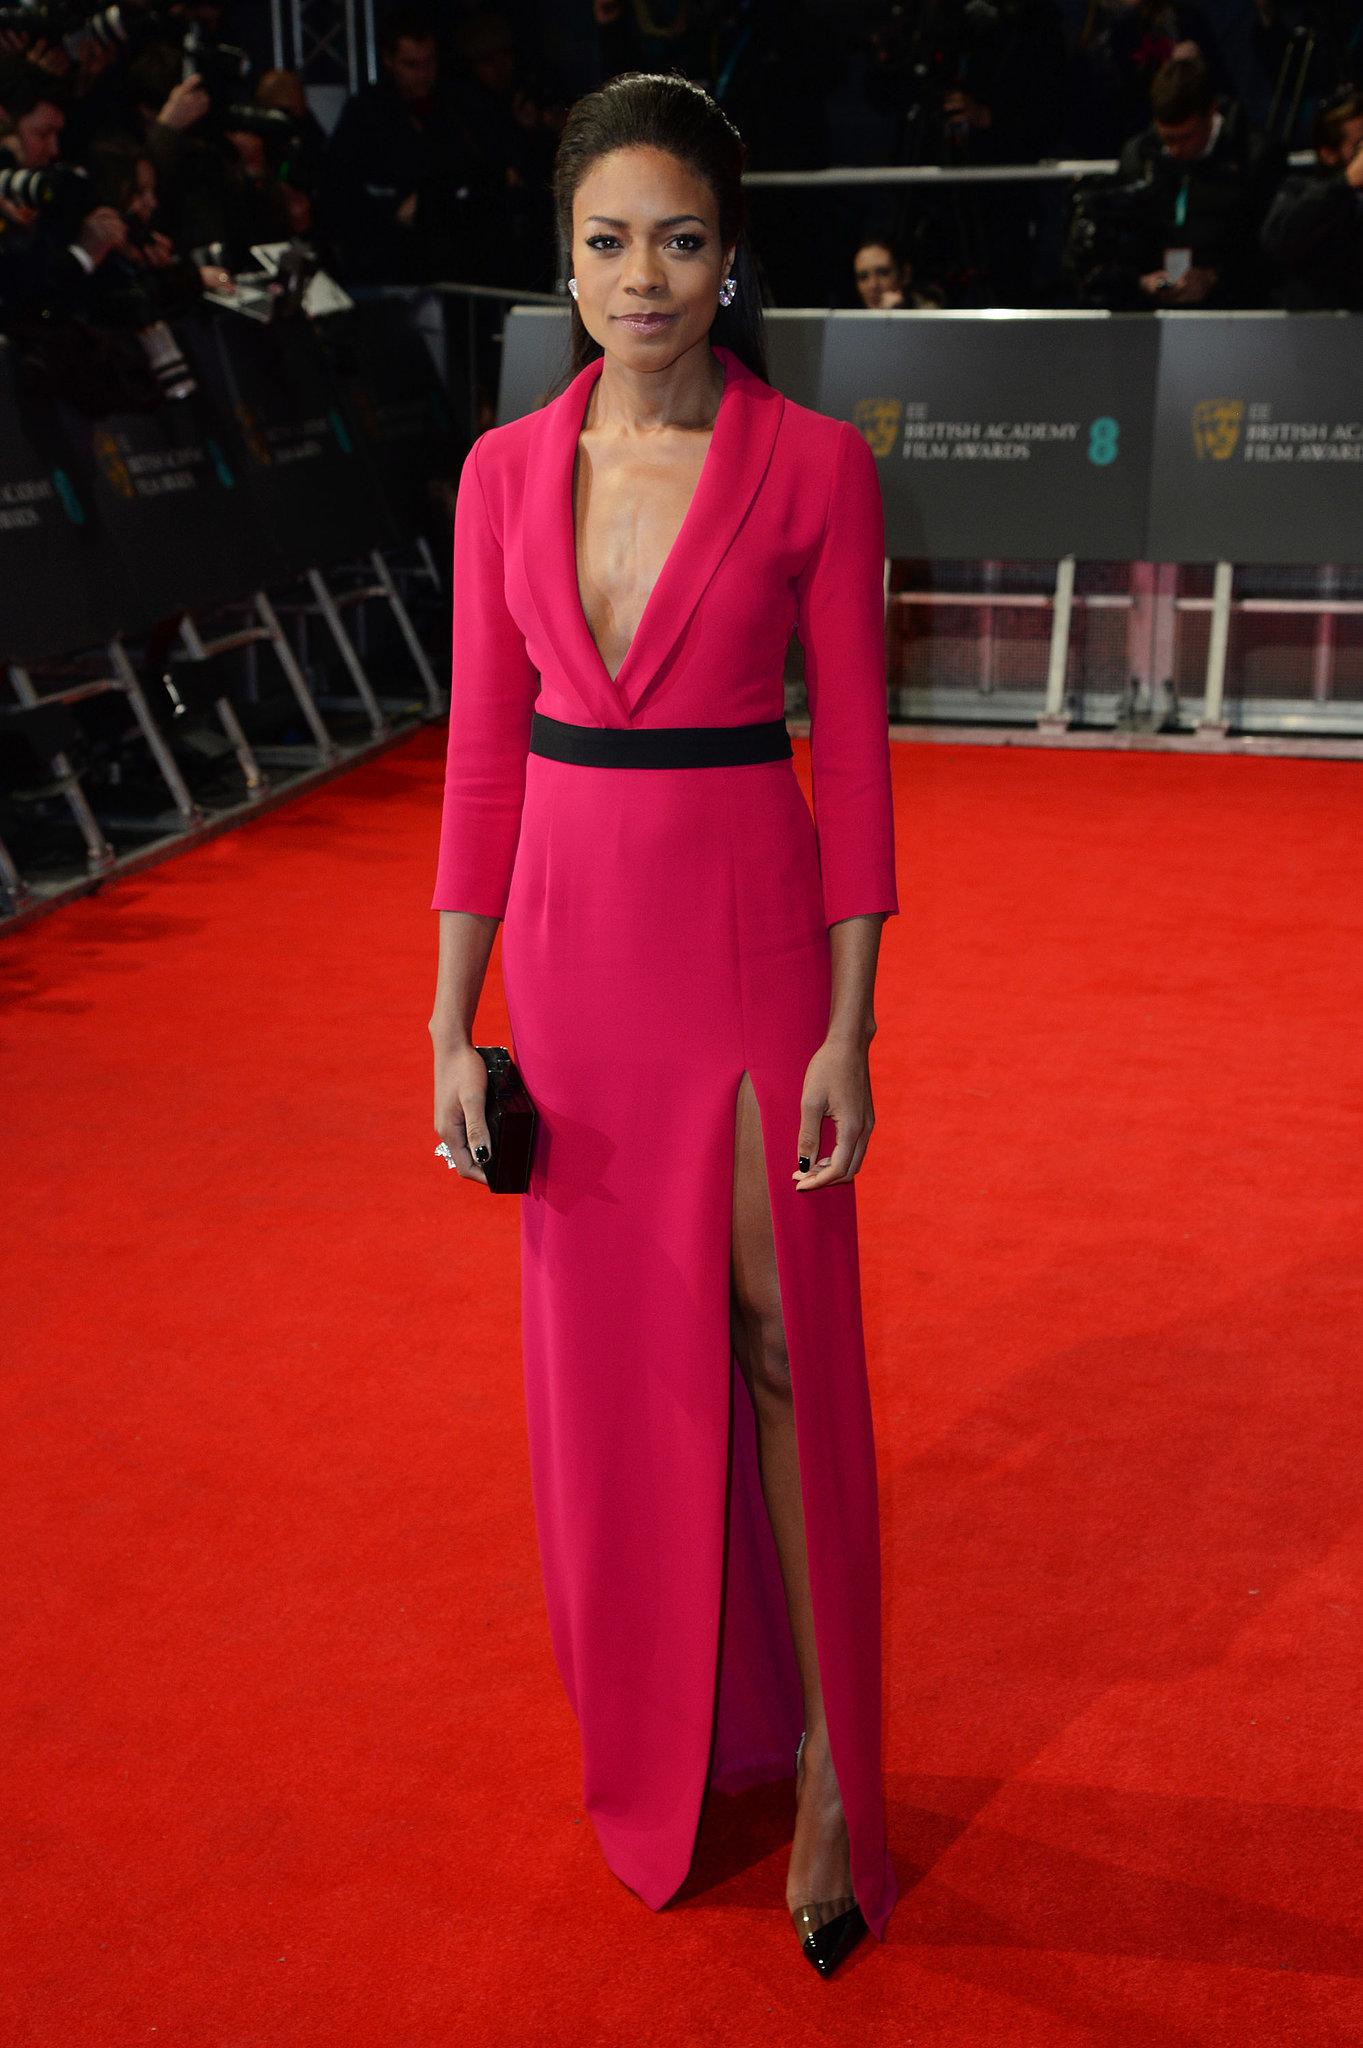 Naomie Harris on the 2014 BAFTA Red Carpet